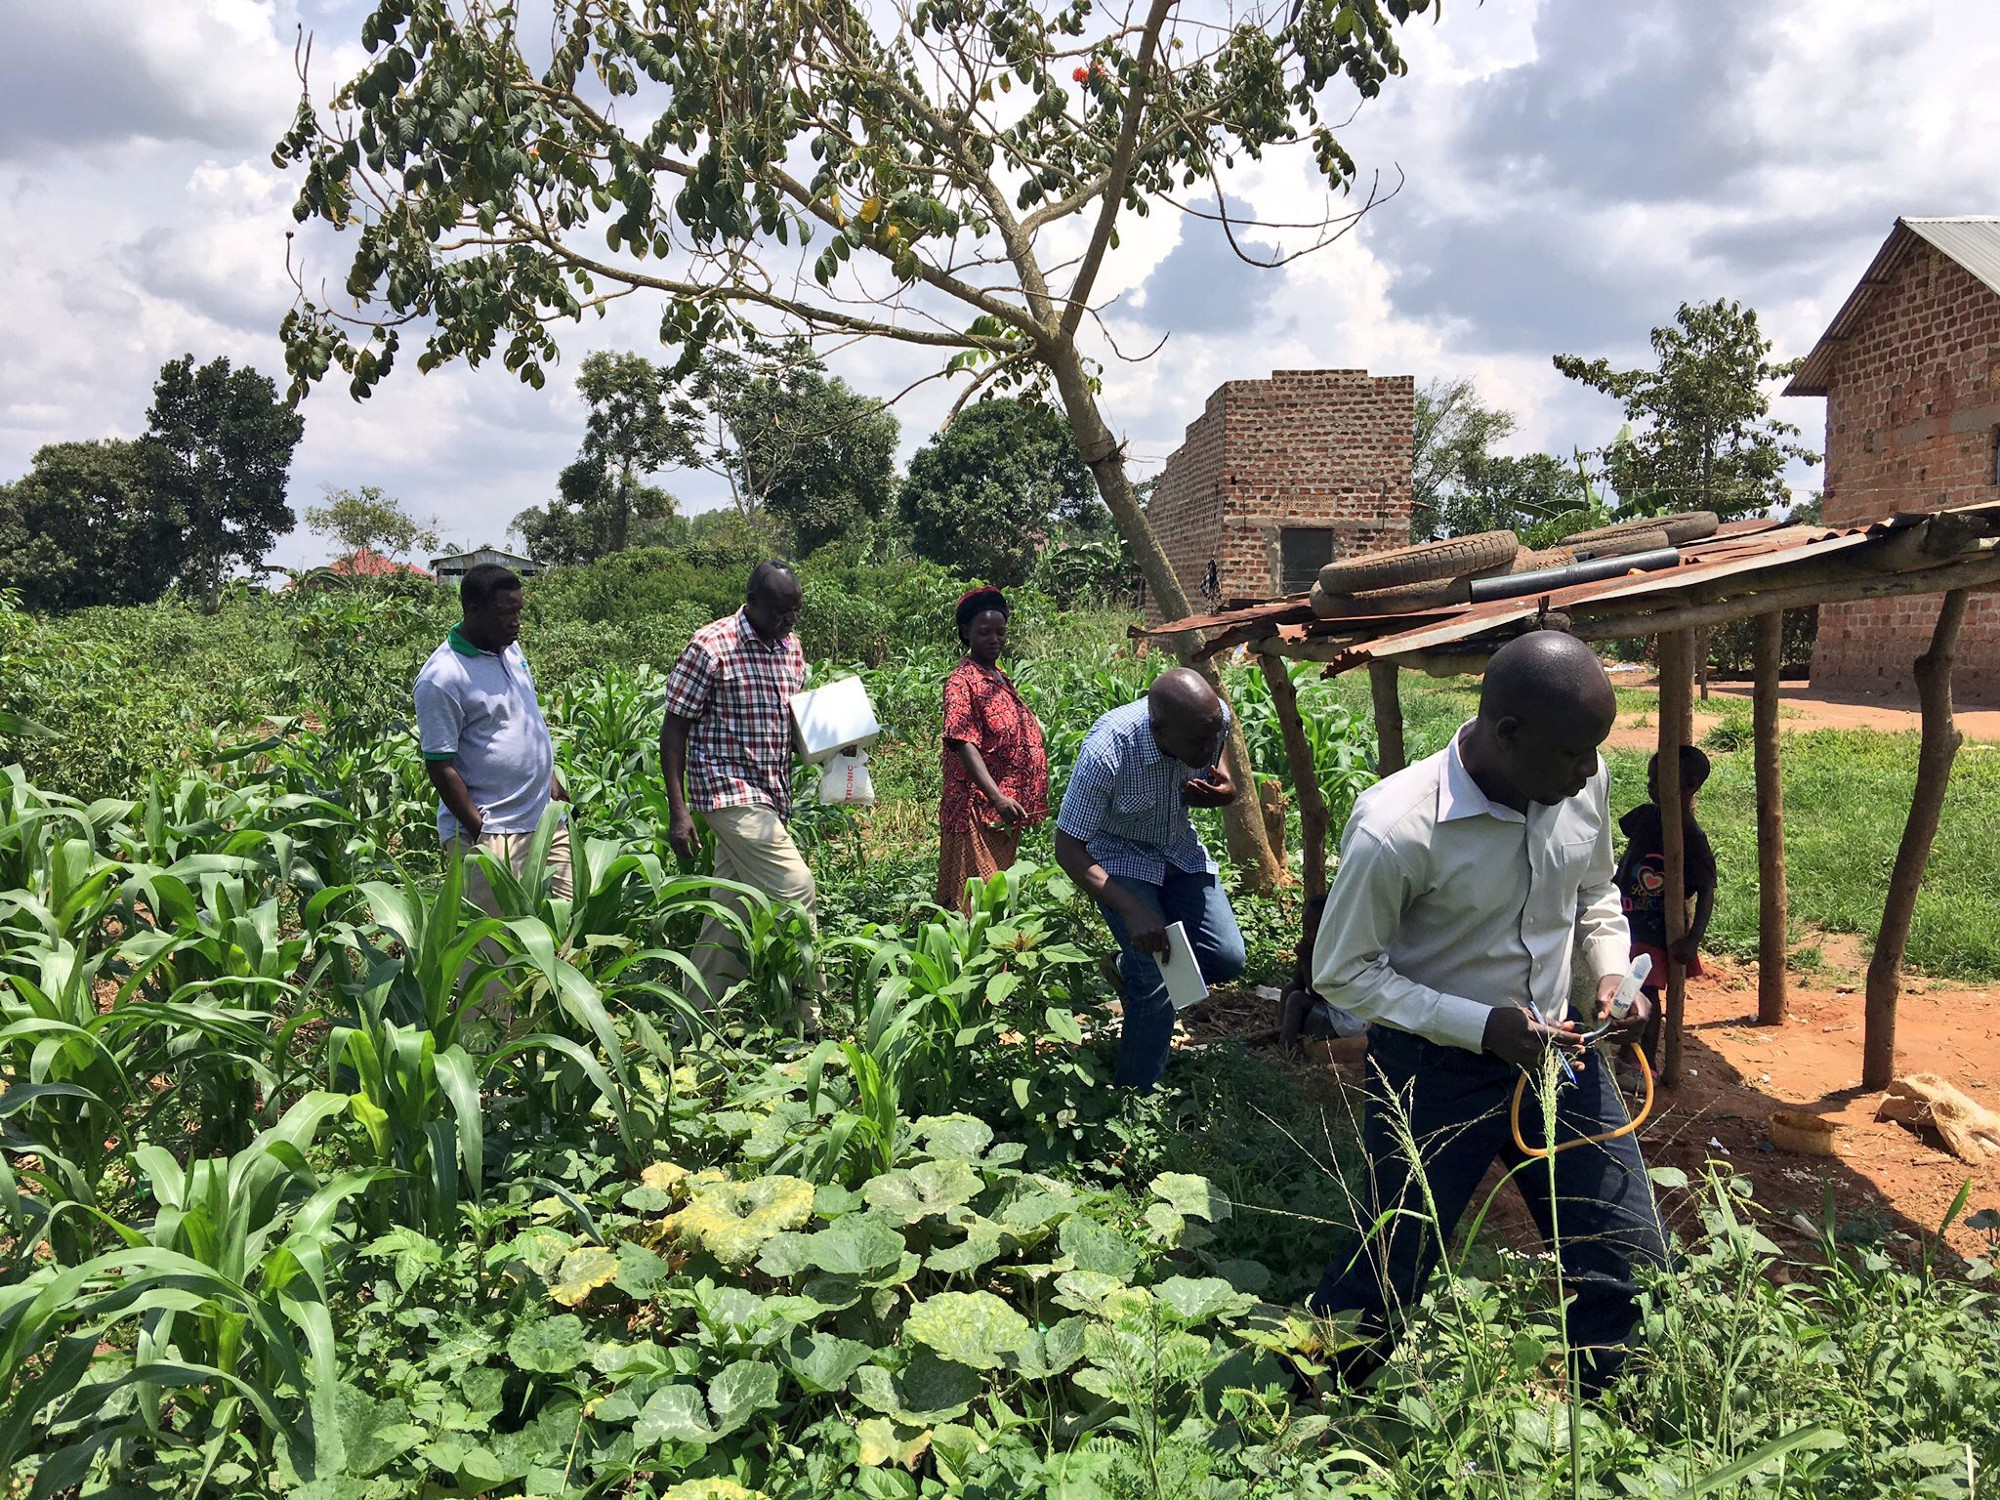 Dr  Emmanuel Ogwok , John Francis Osingada, Geoffrey Okao-Okuja, and Phillip Abidrabo collect samples on Naomi Kutesakwe's farm in Wakiso, Uganda. Photo: Laura Boykin